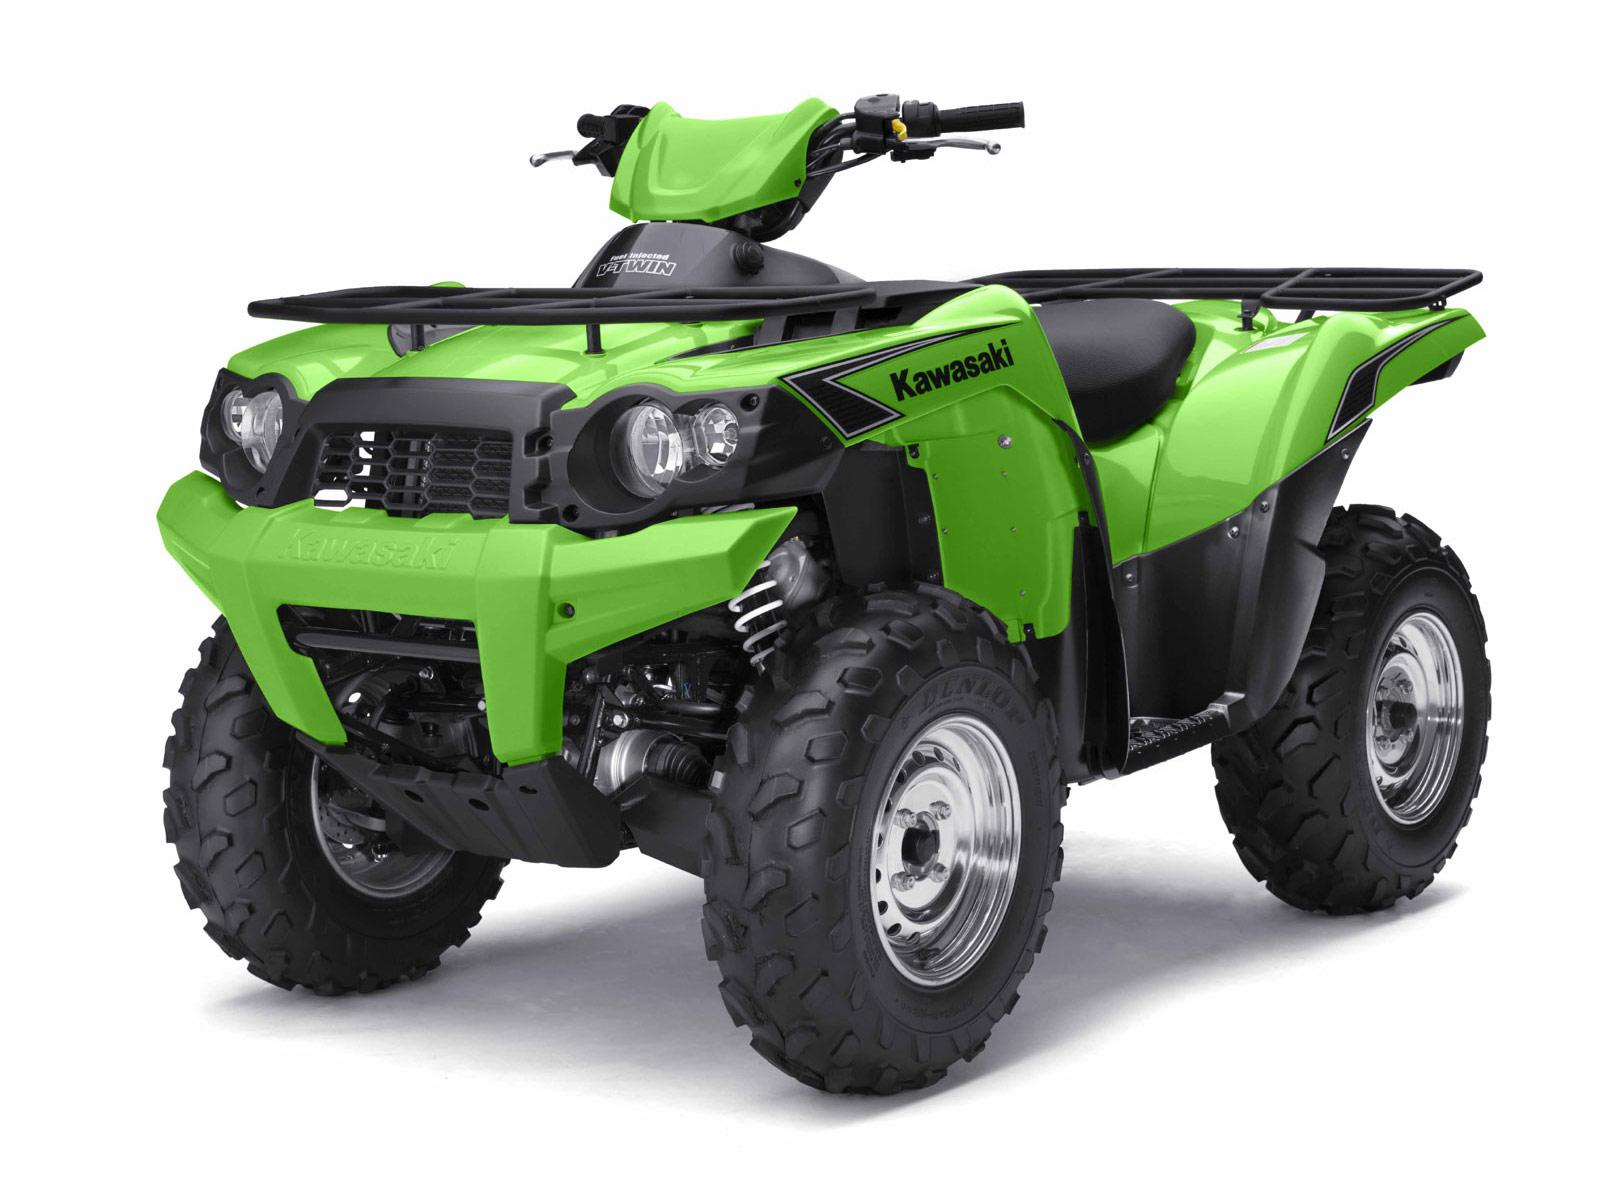 4 4i terrain property not resale fuel air intake systems reset procedure similar training course add cart kawasaki brute force 650 manual  [ 1600 x 1200 Pixel ]